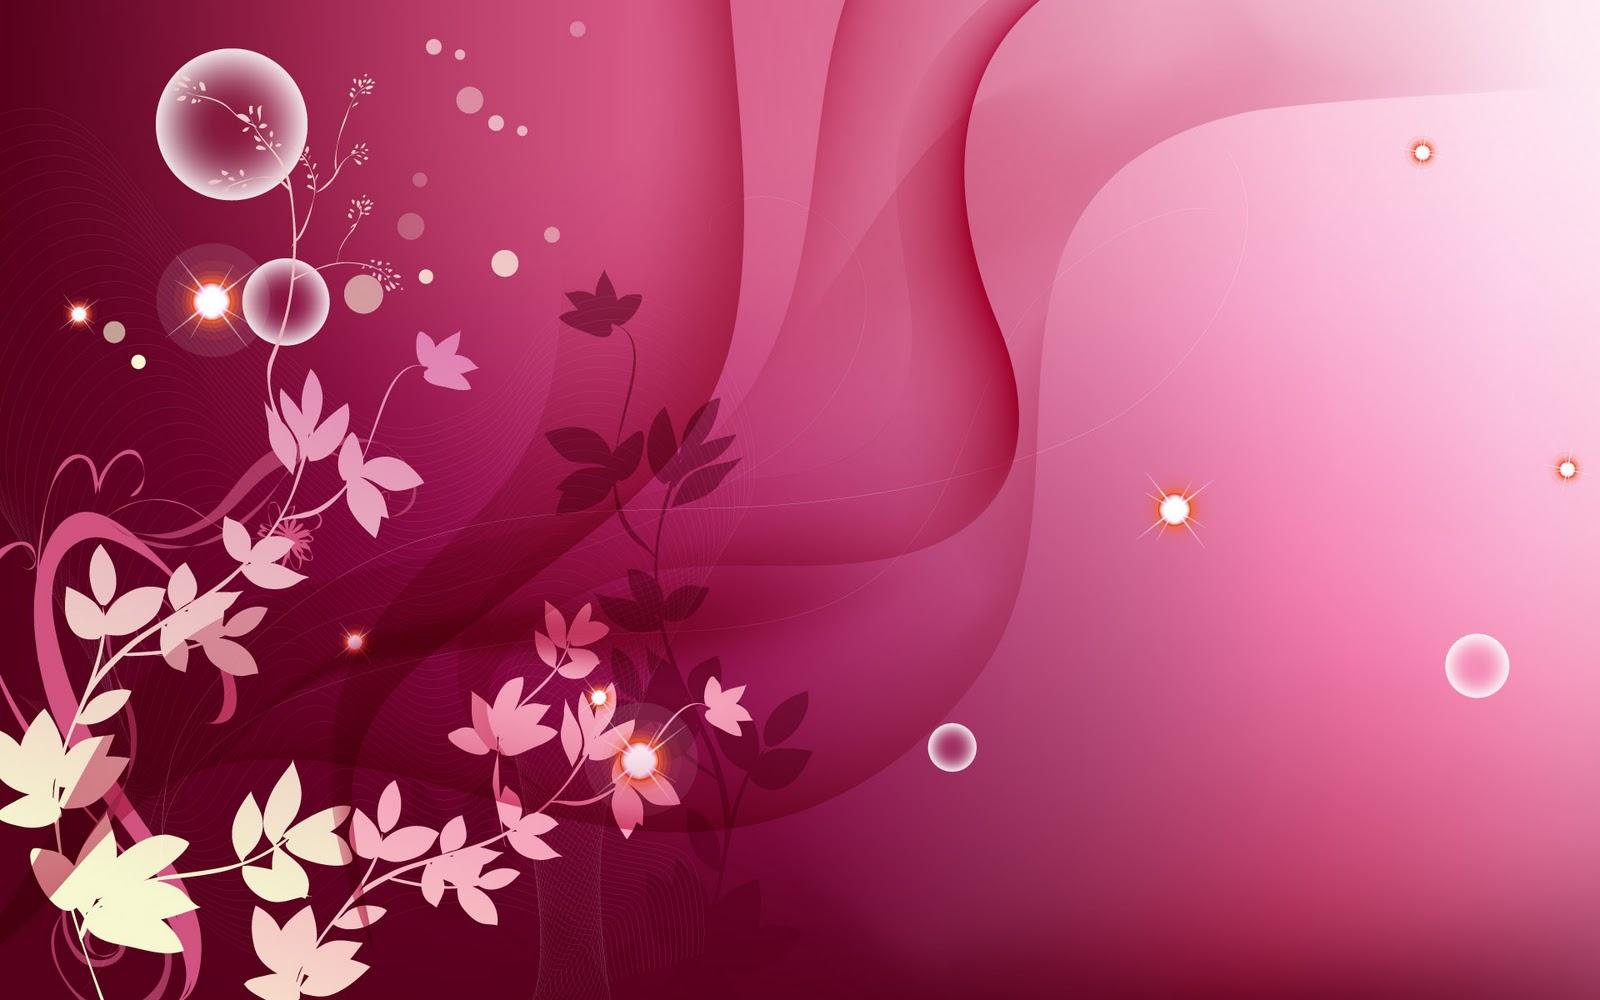 pink wallpapers hd free download wallpaper dawallpaperz